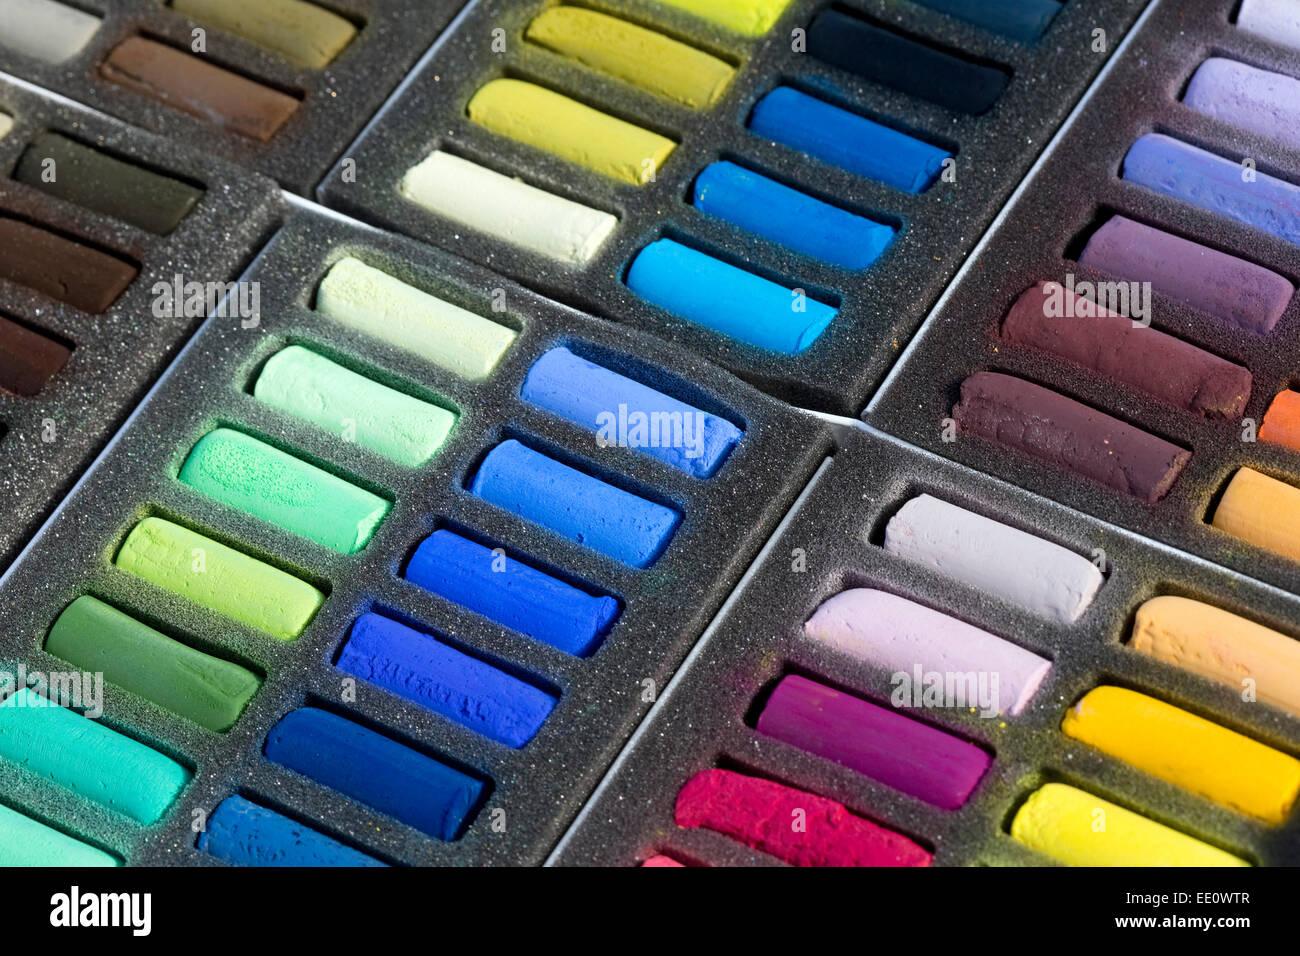 Chalk Pastel Set - Stock Image